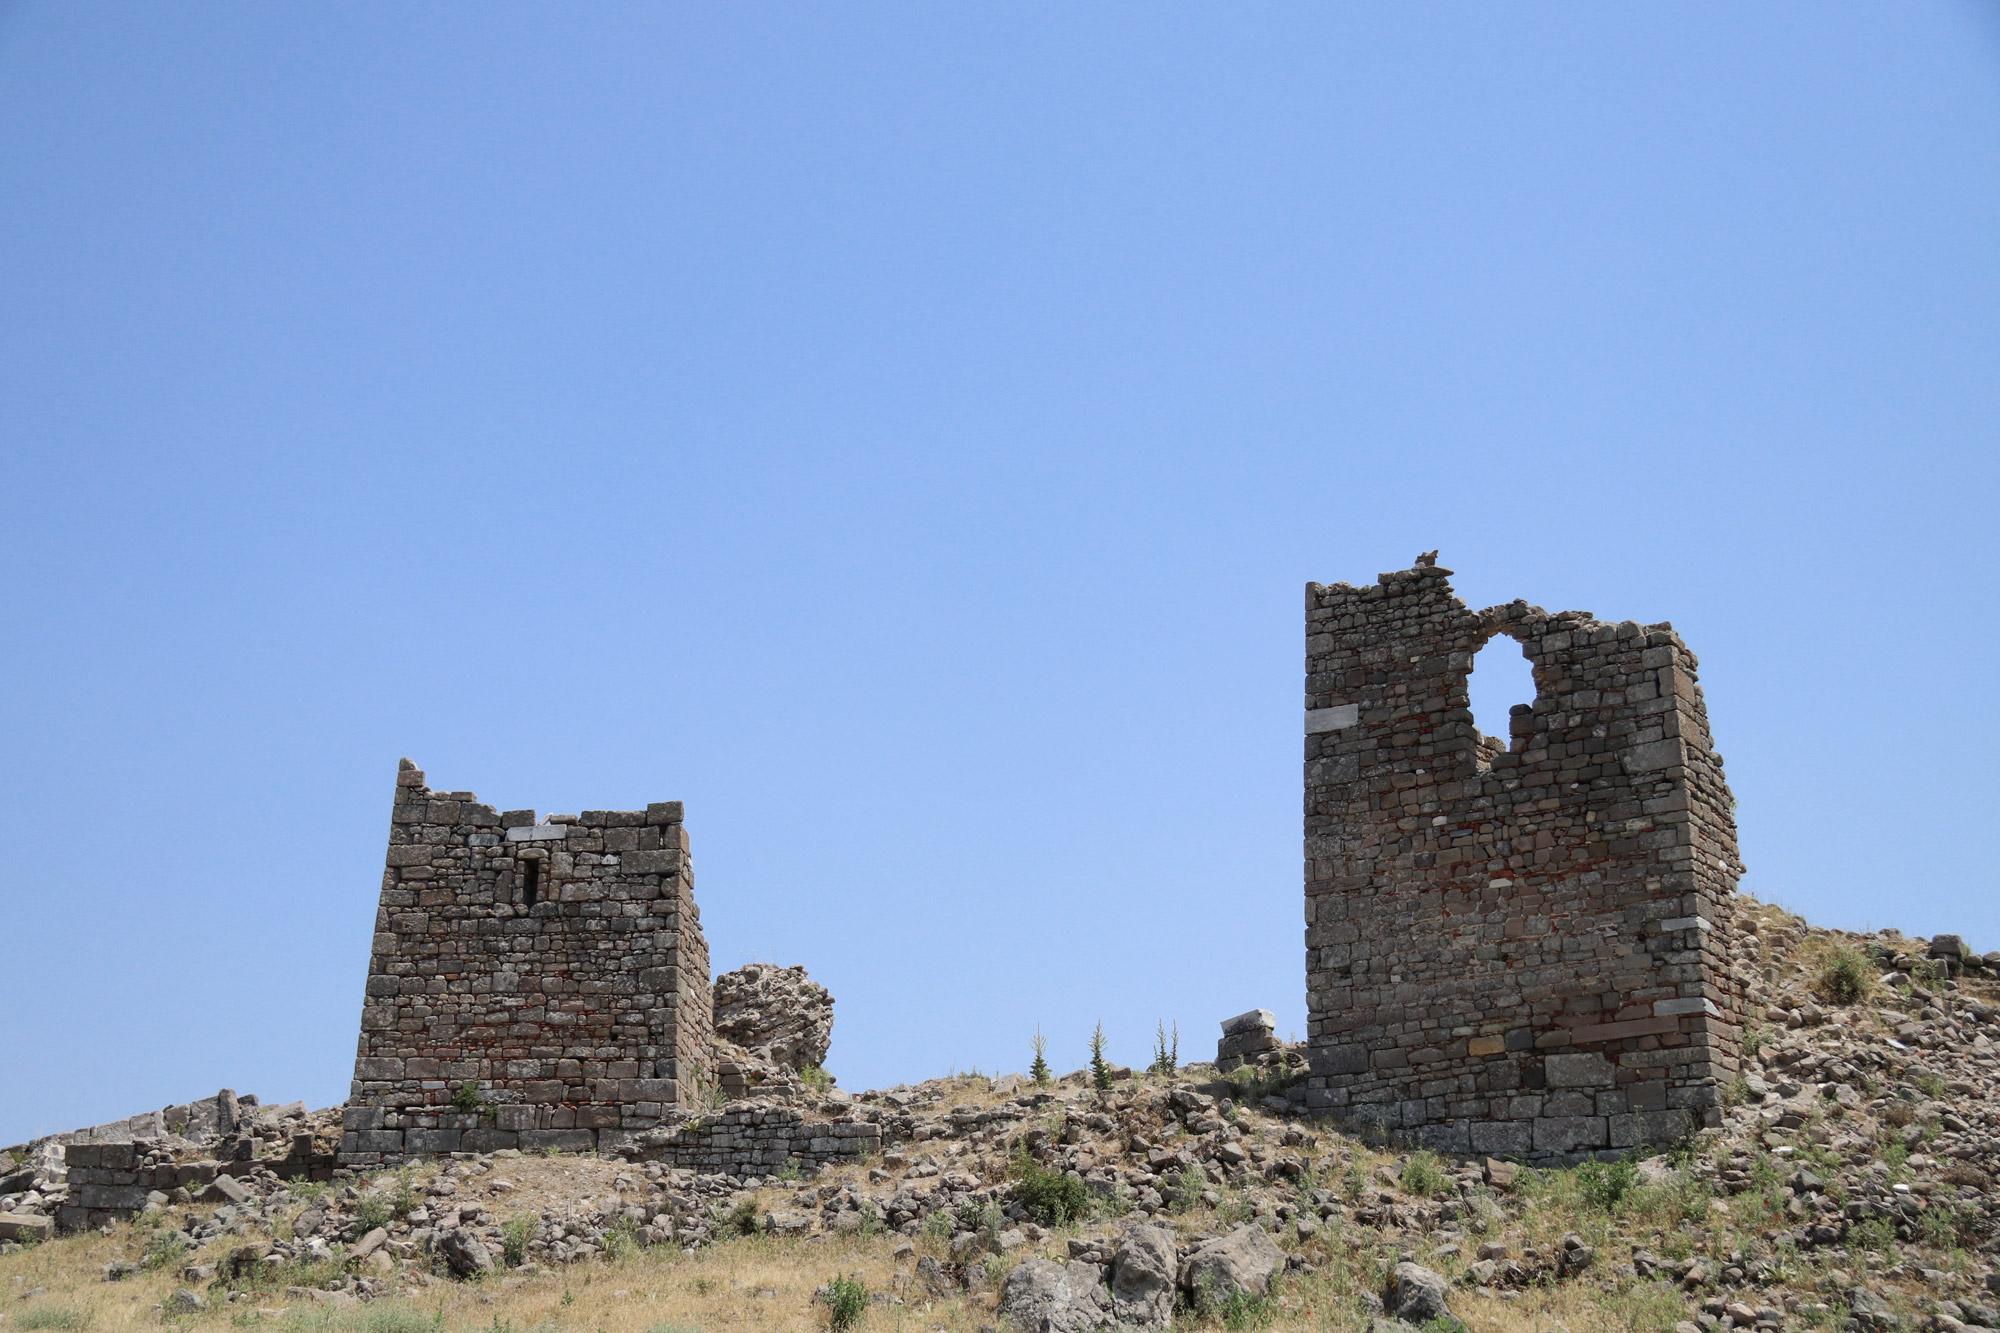 Turkije reisverslag: Bergama en Ayvalik - De oude stadsmuren van Bergama